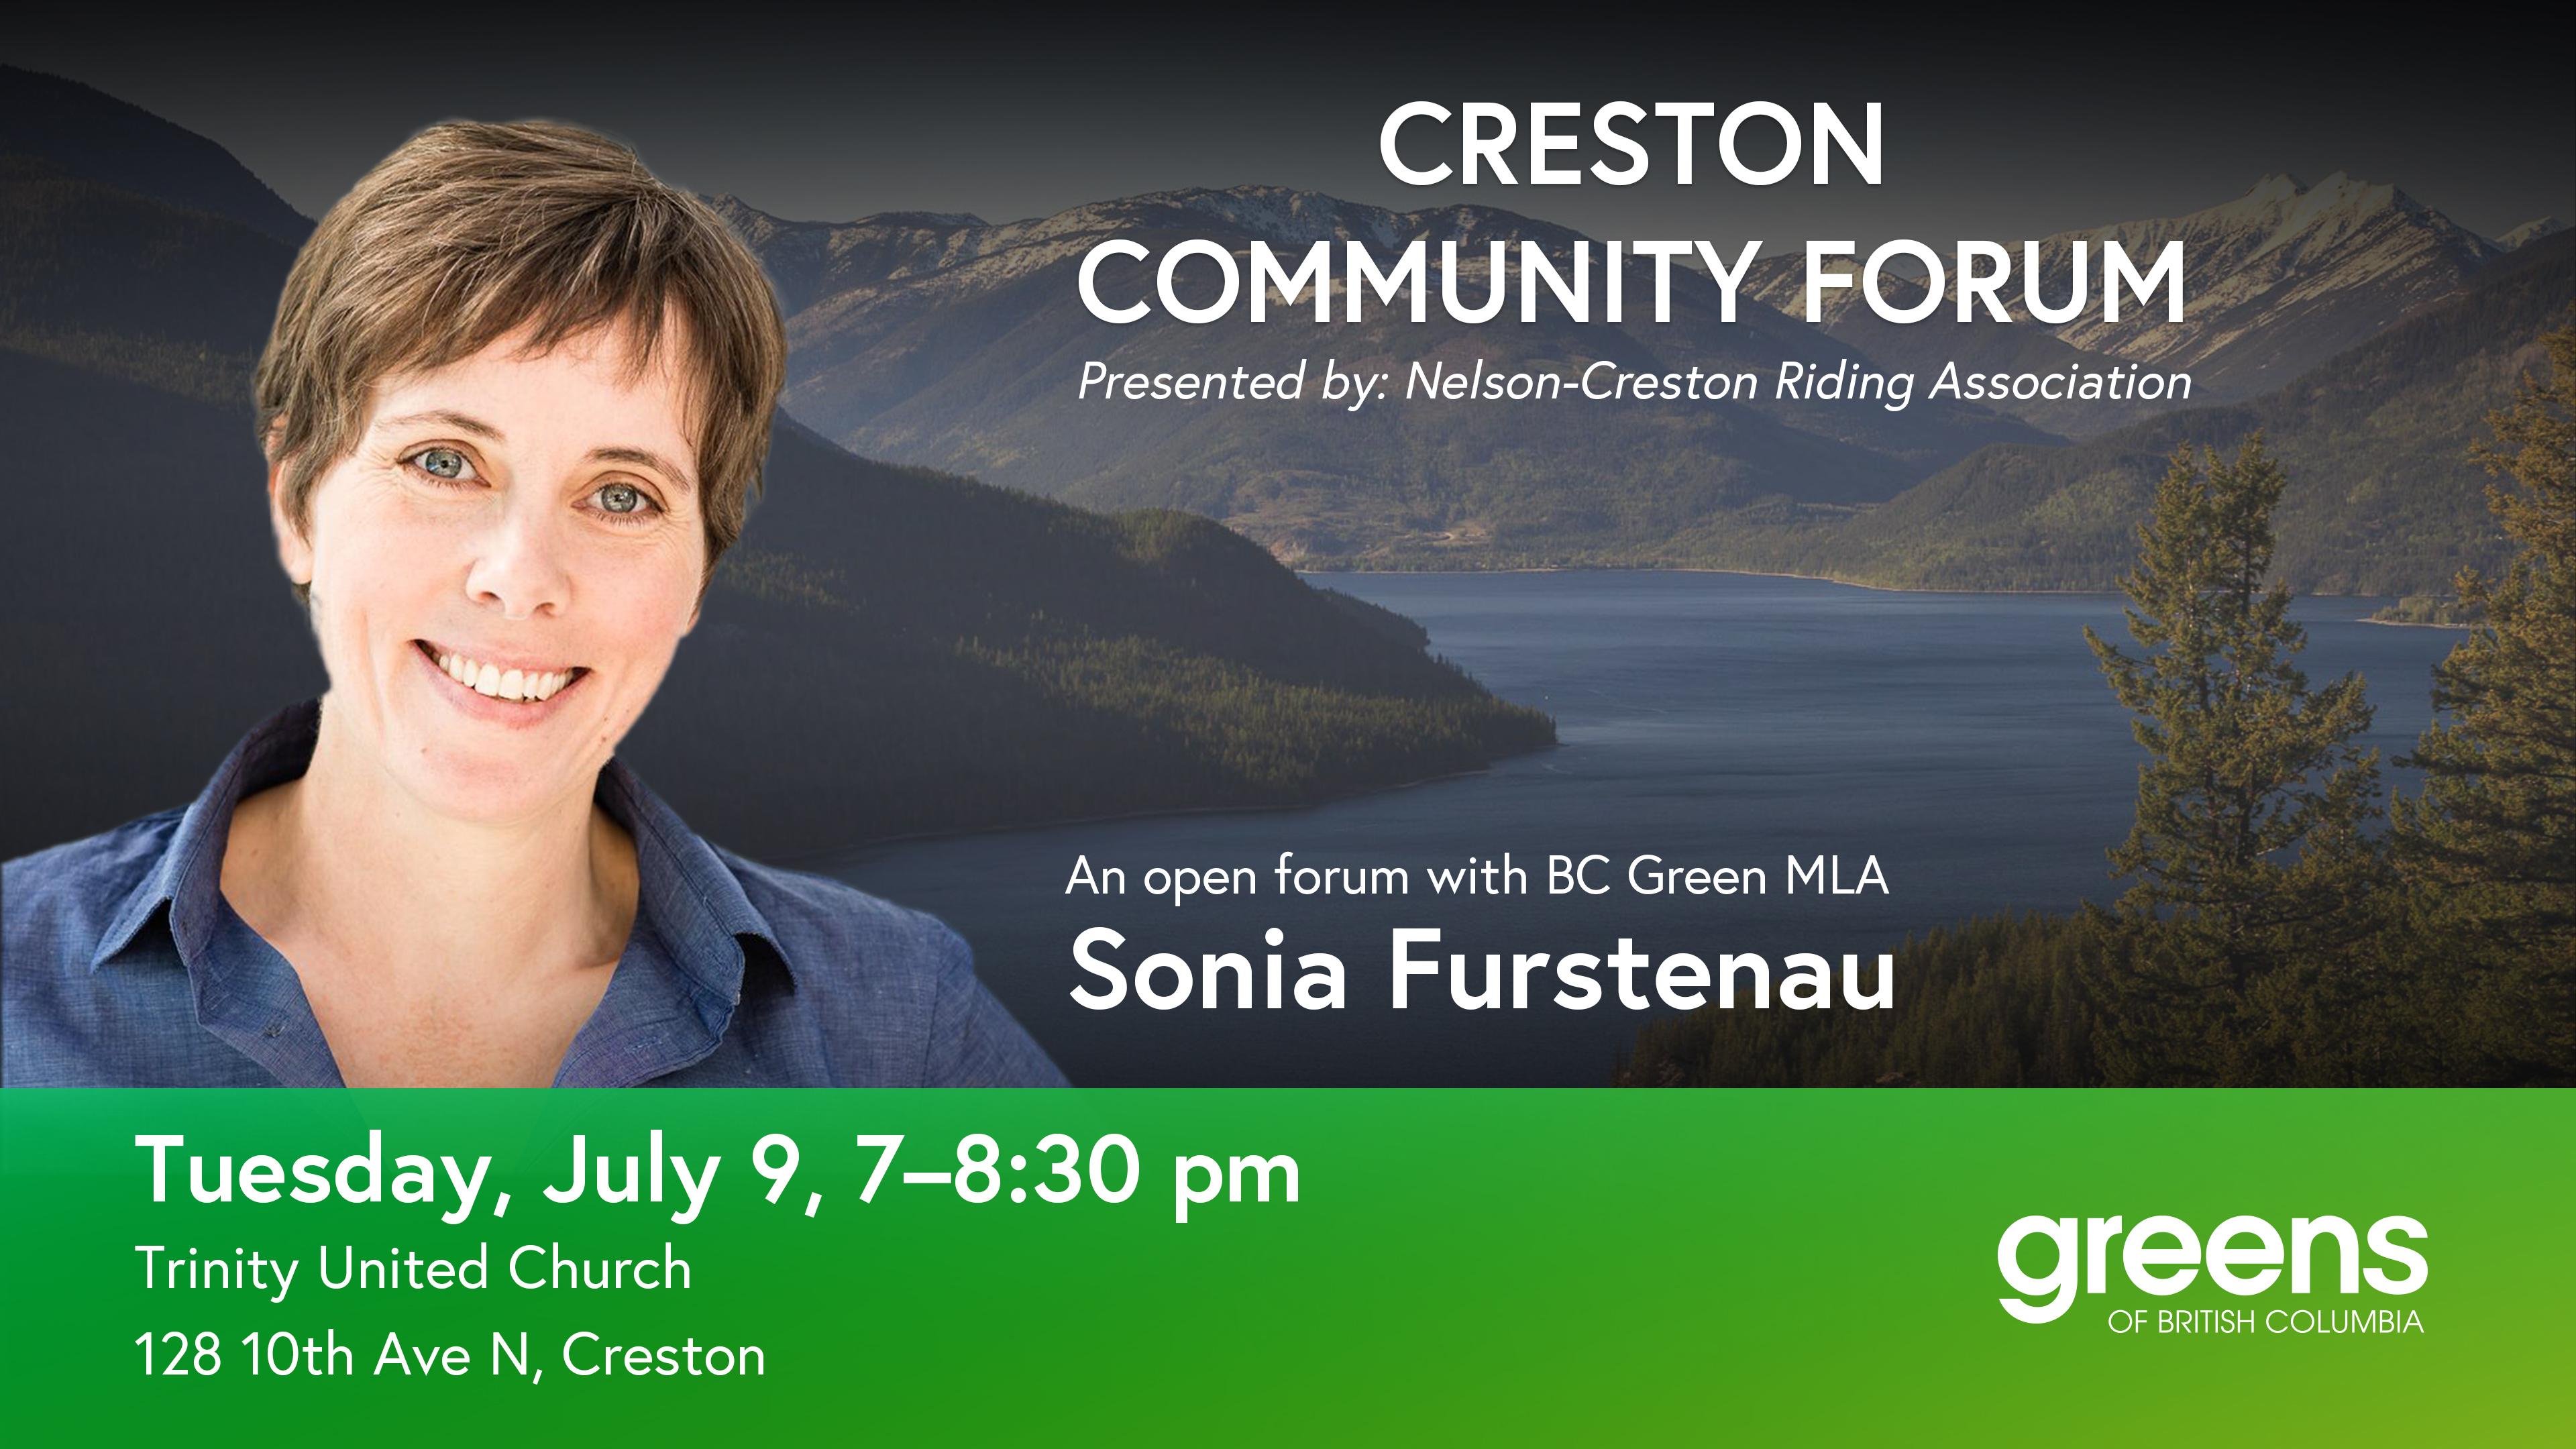 190703-Creston_Community_Forum.jpg